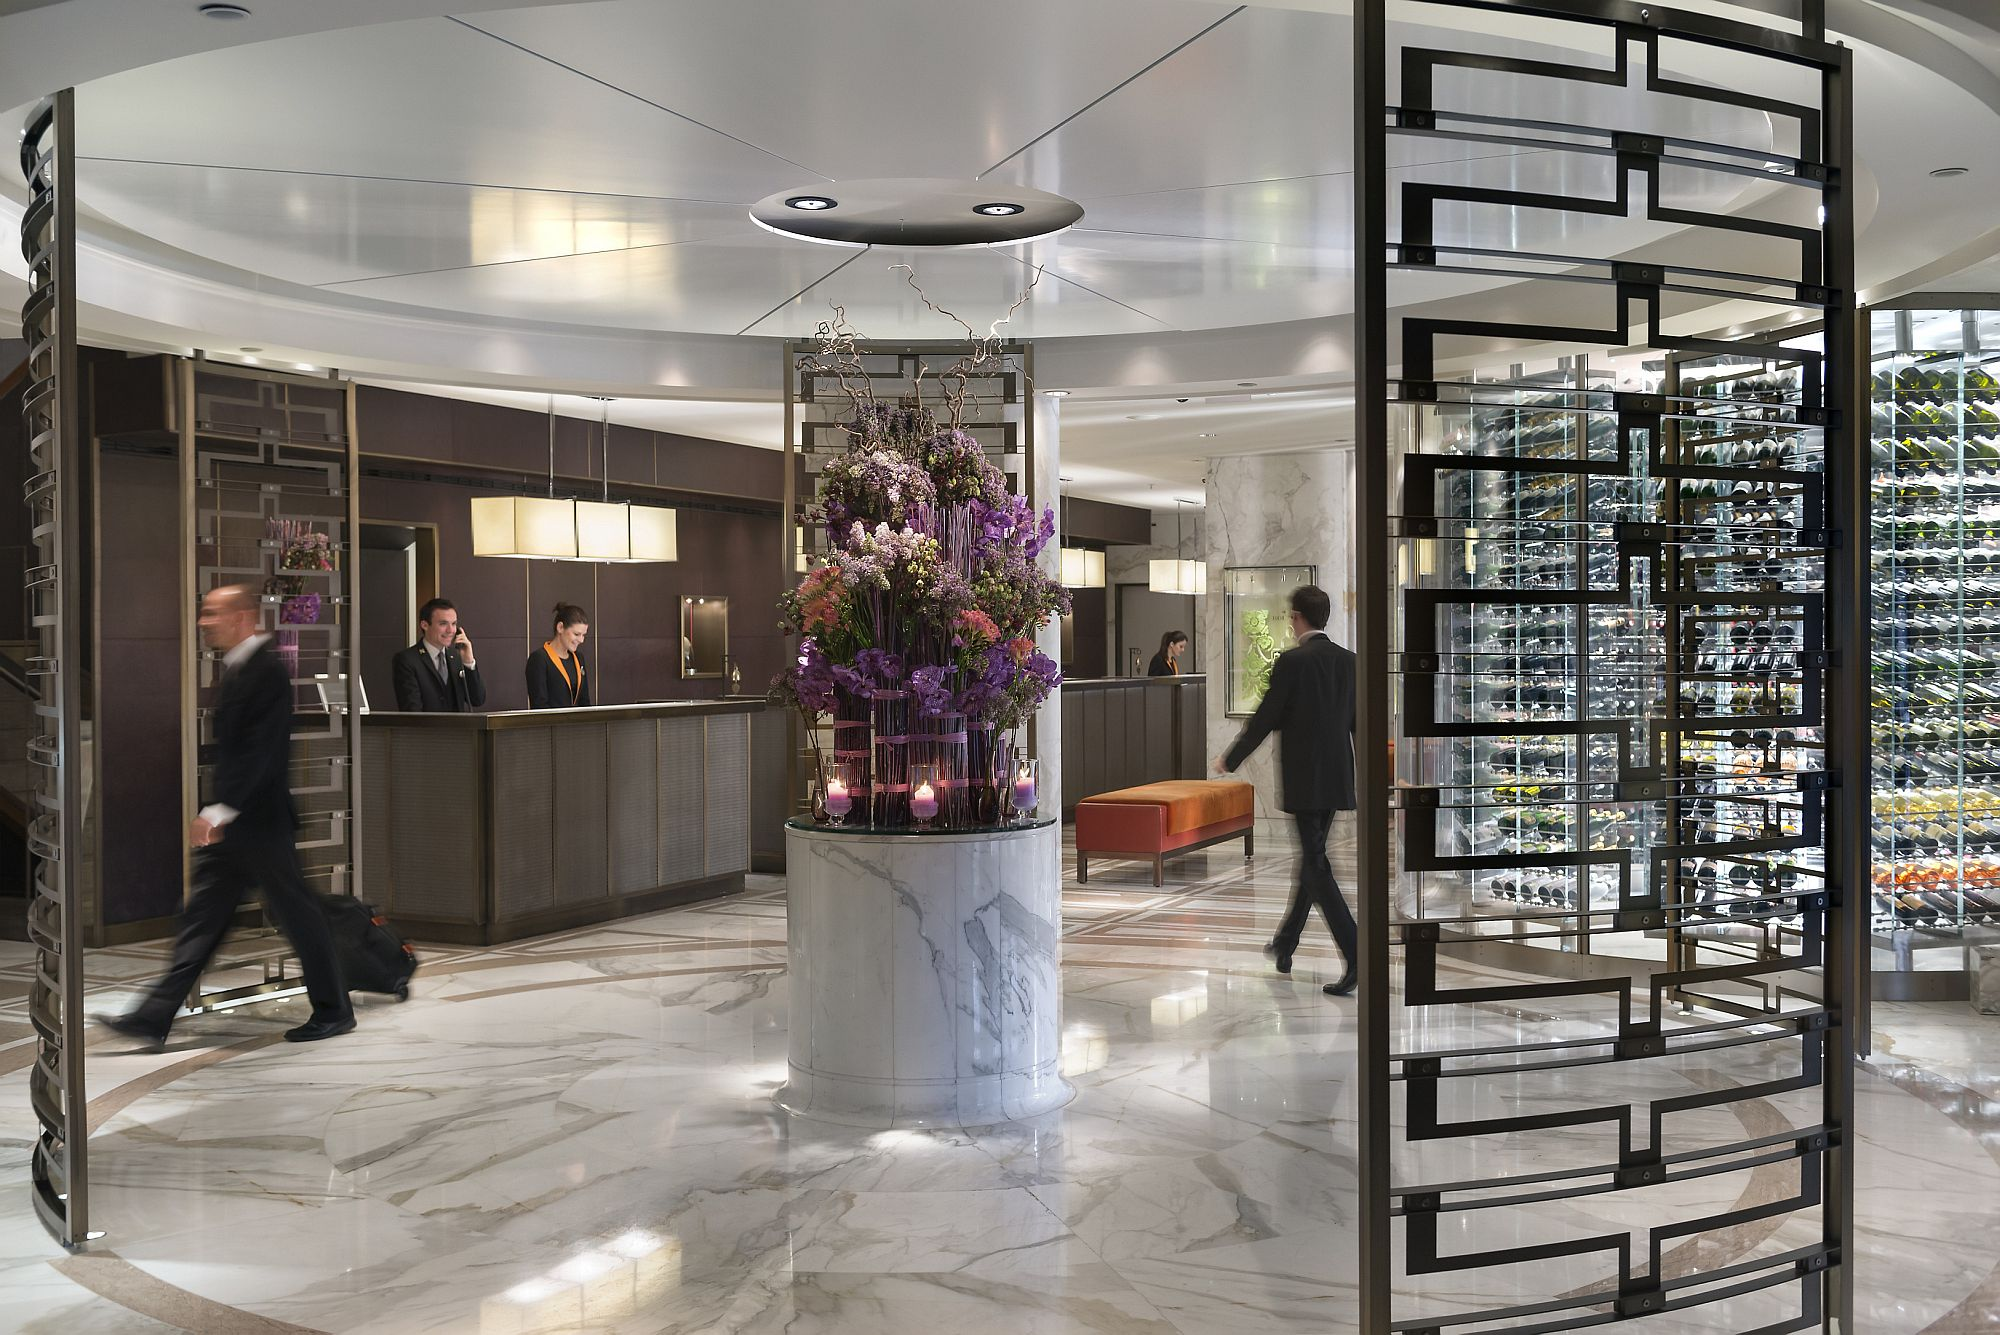 Lobby of the Mandarin Oriental, Geneva